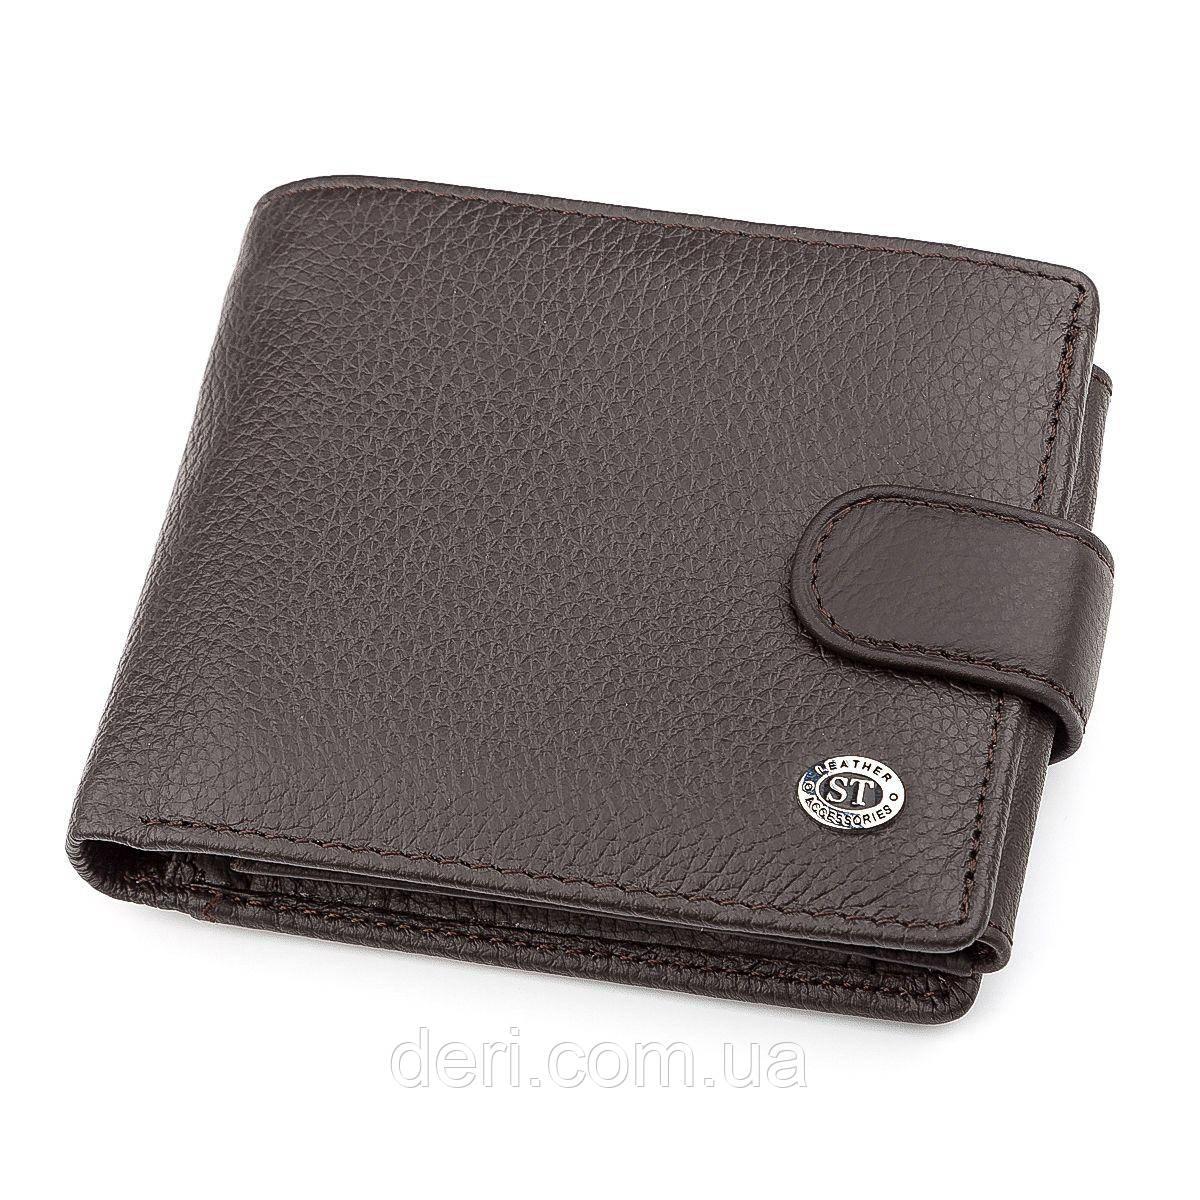 Мужской кошелек ST Leather 18335 (ST102) Коричневый, Коричневый